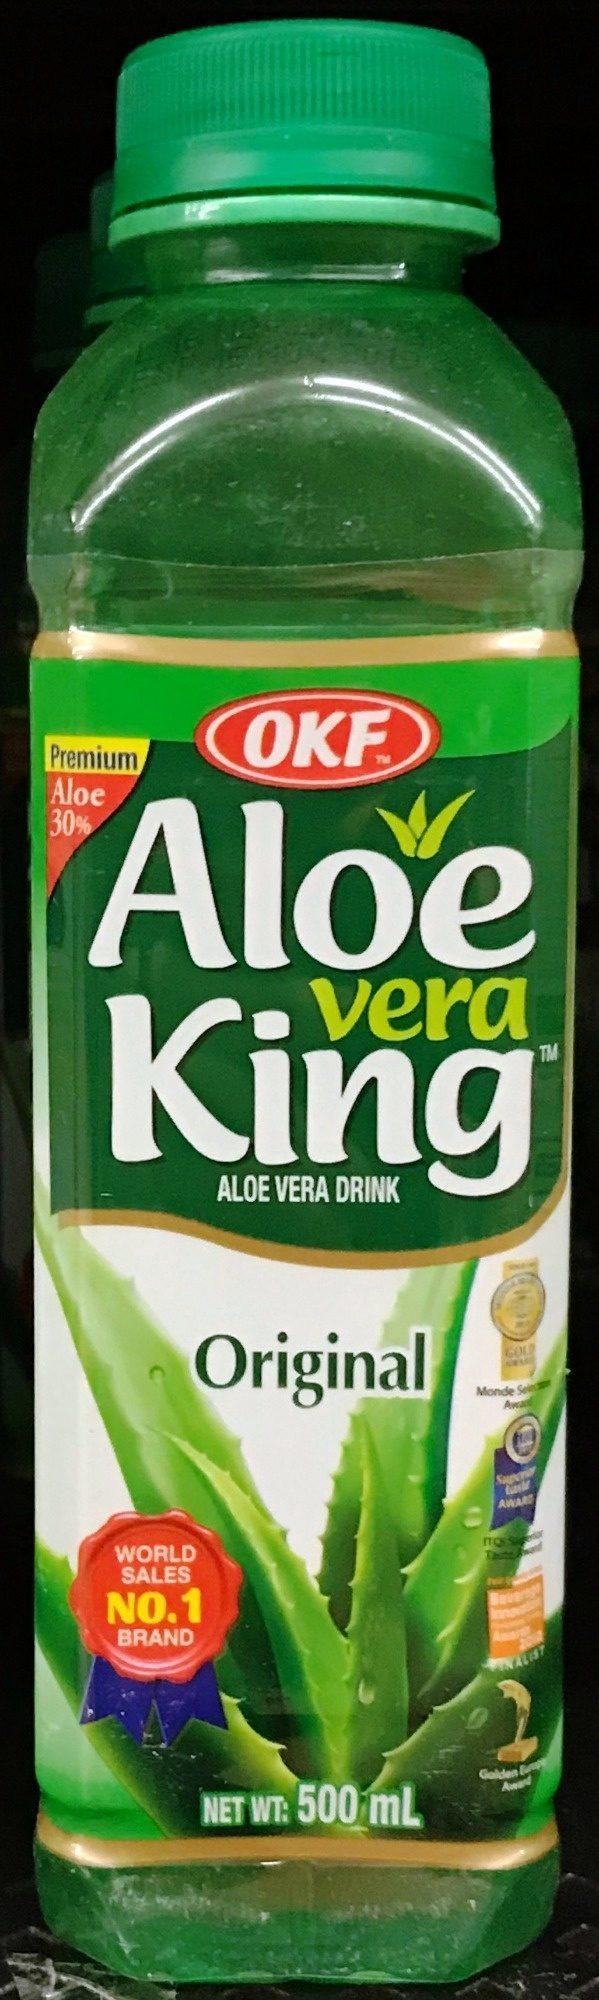 Okf Aloe Vera King Natural, Original - Product